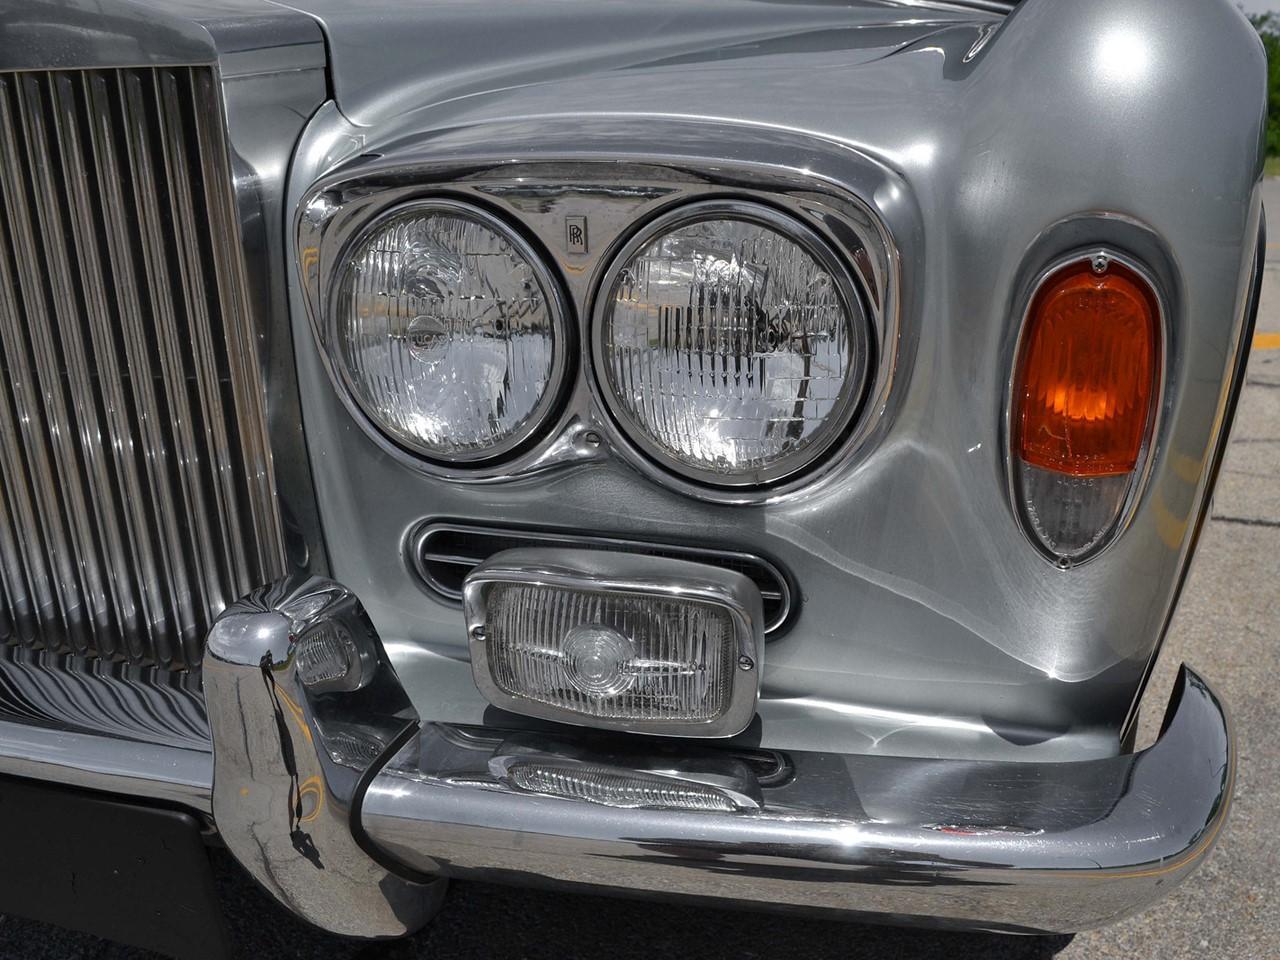 1967 MPW Fixedhead coupe 1